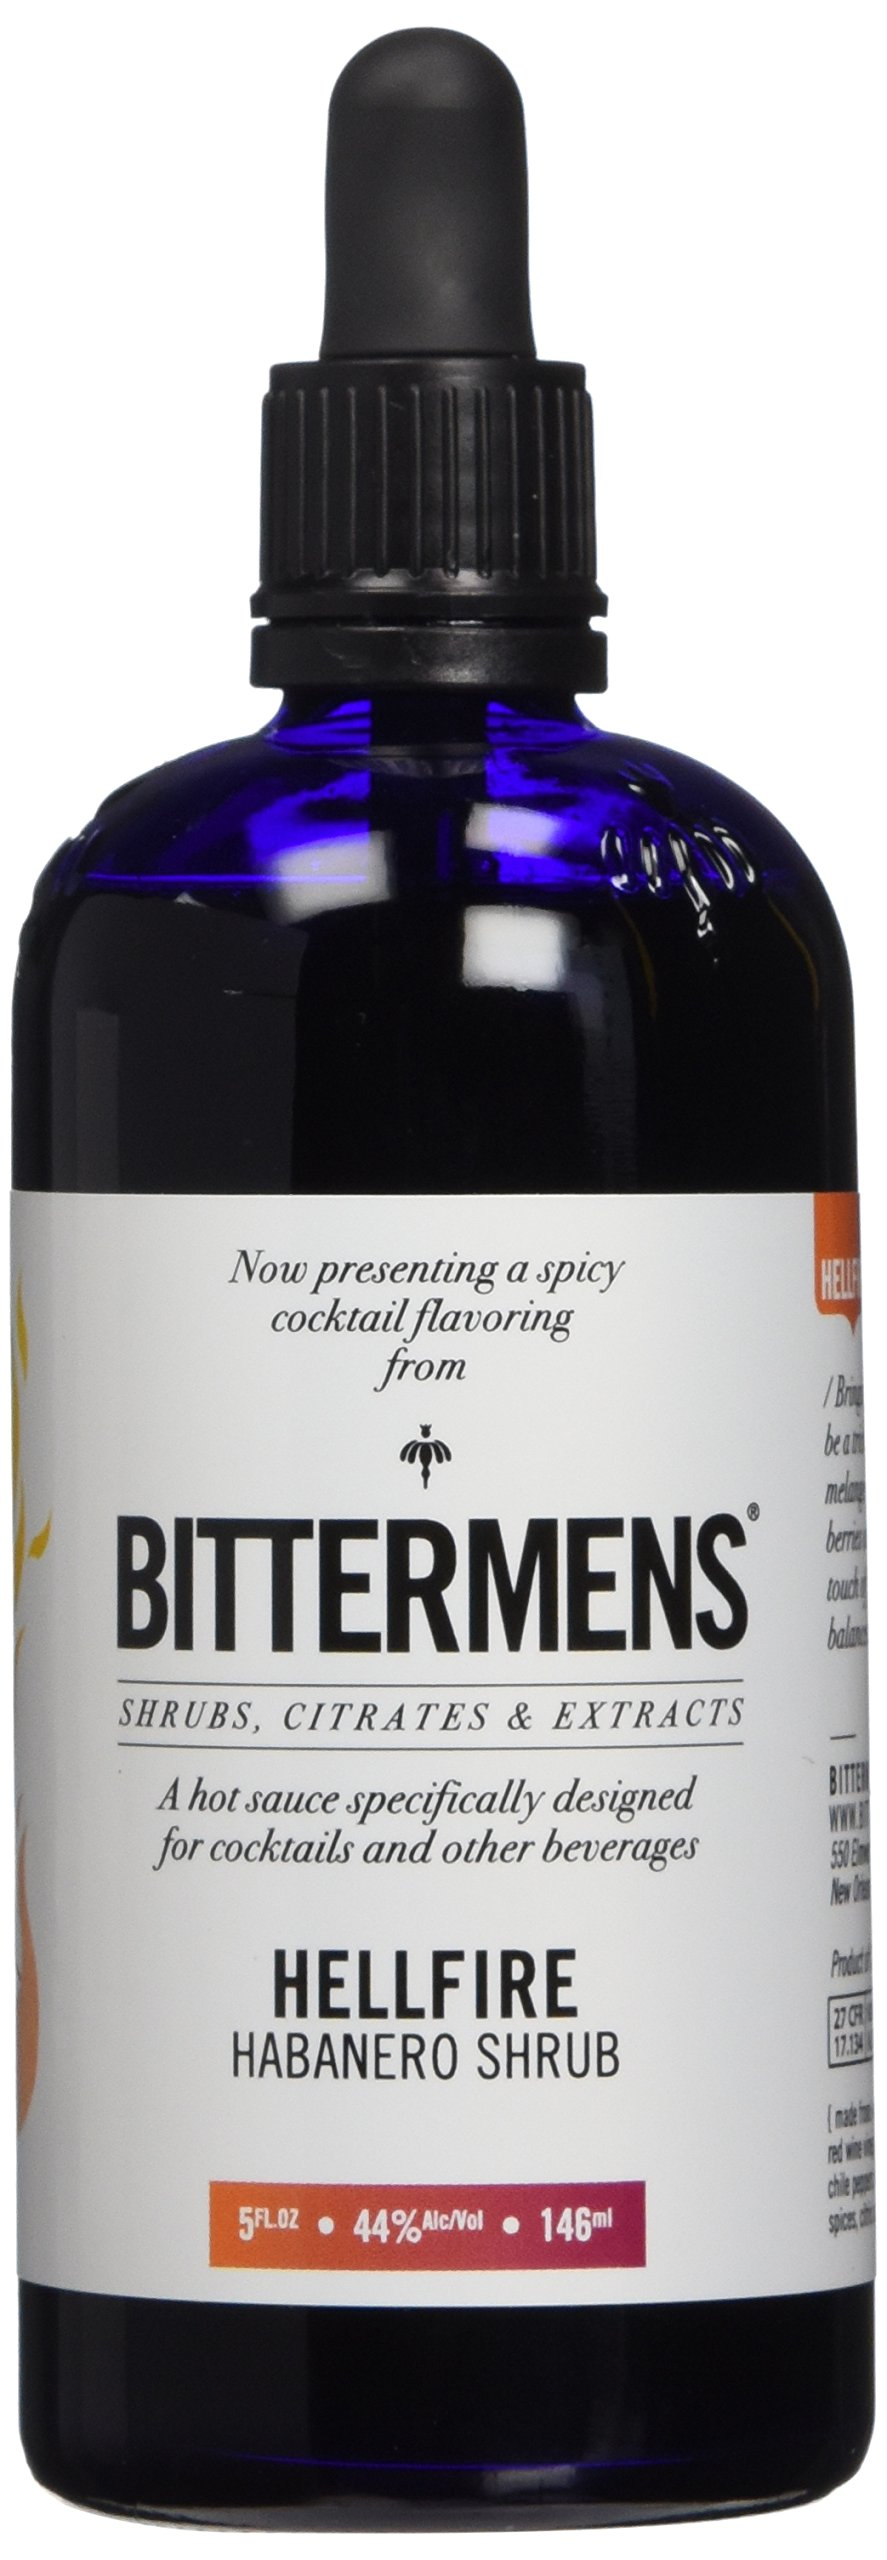 Bittermens Hellfire Habanero Shrub Cocktail Bitters – 4 oz